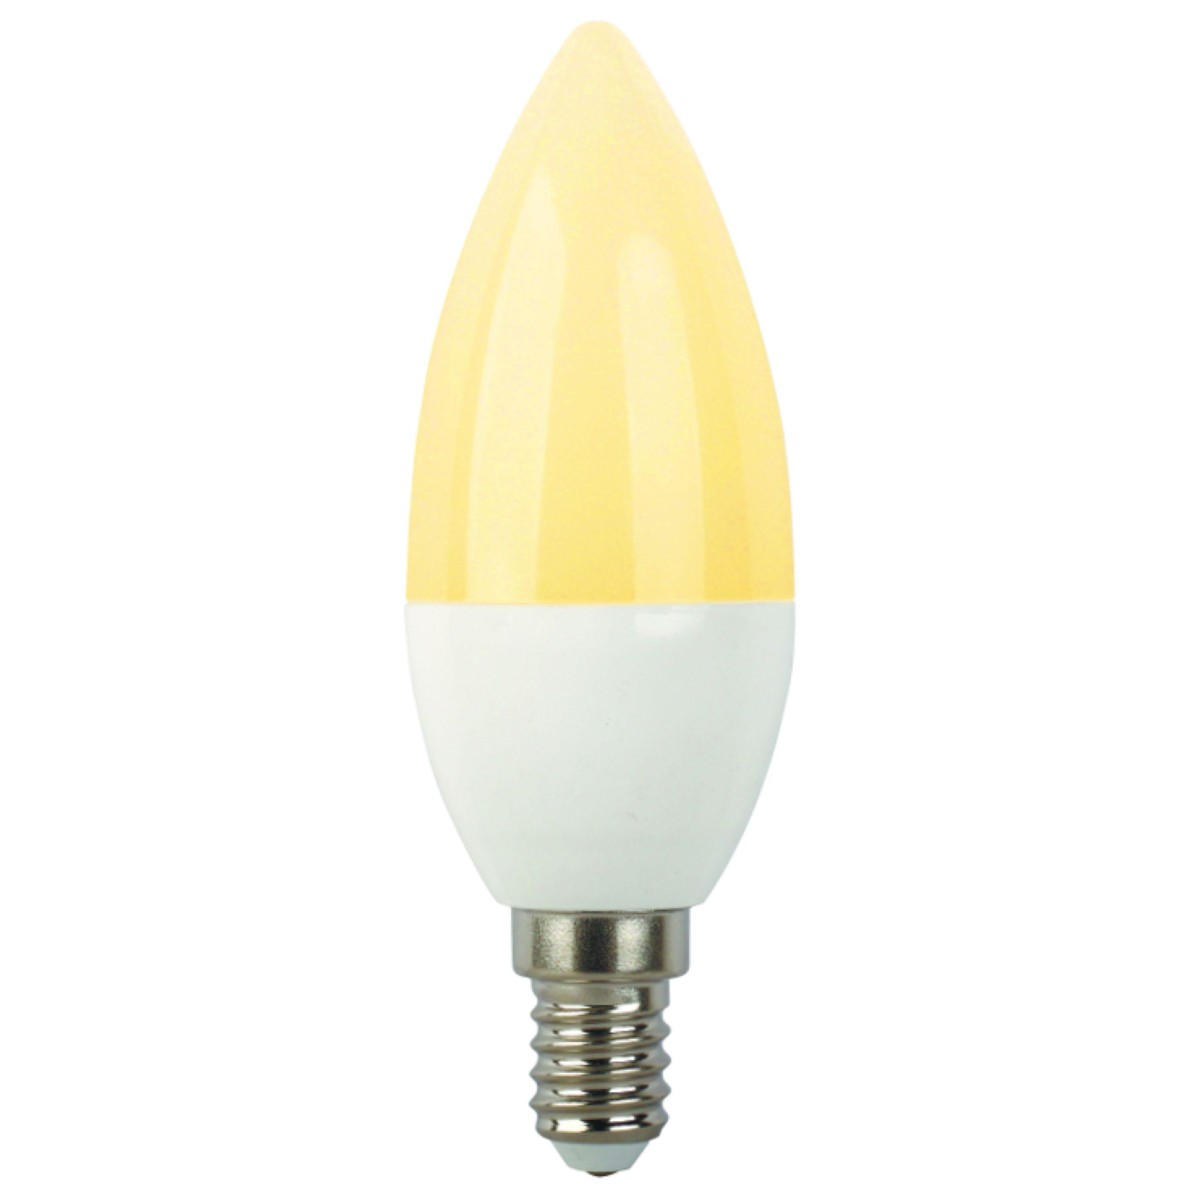 Лампа Ecola Premium светодионая E14 8 Вт свеча 640 Лм теплый свет